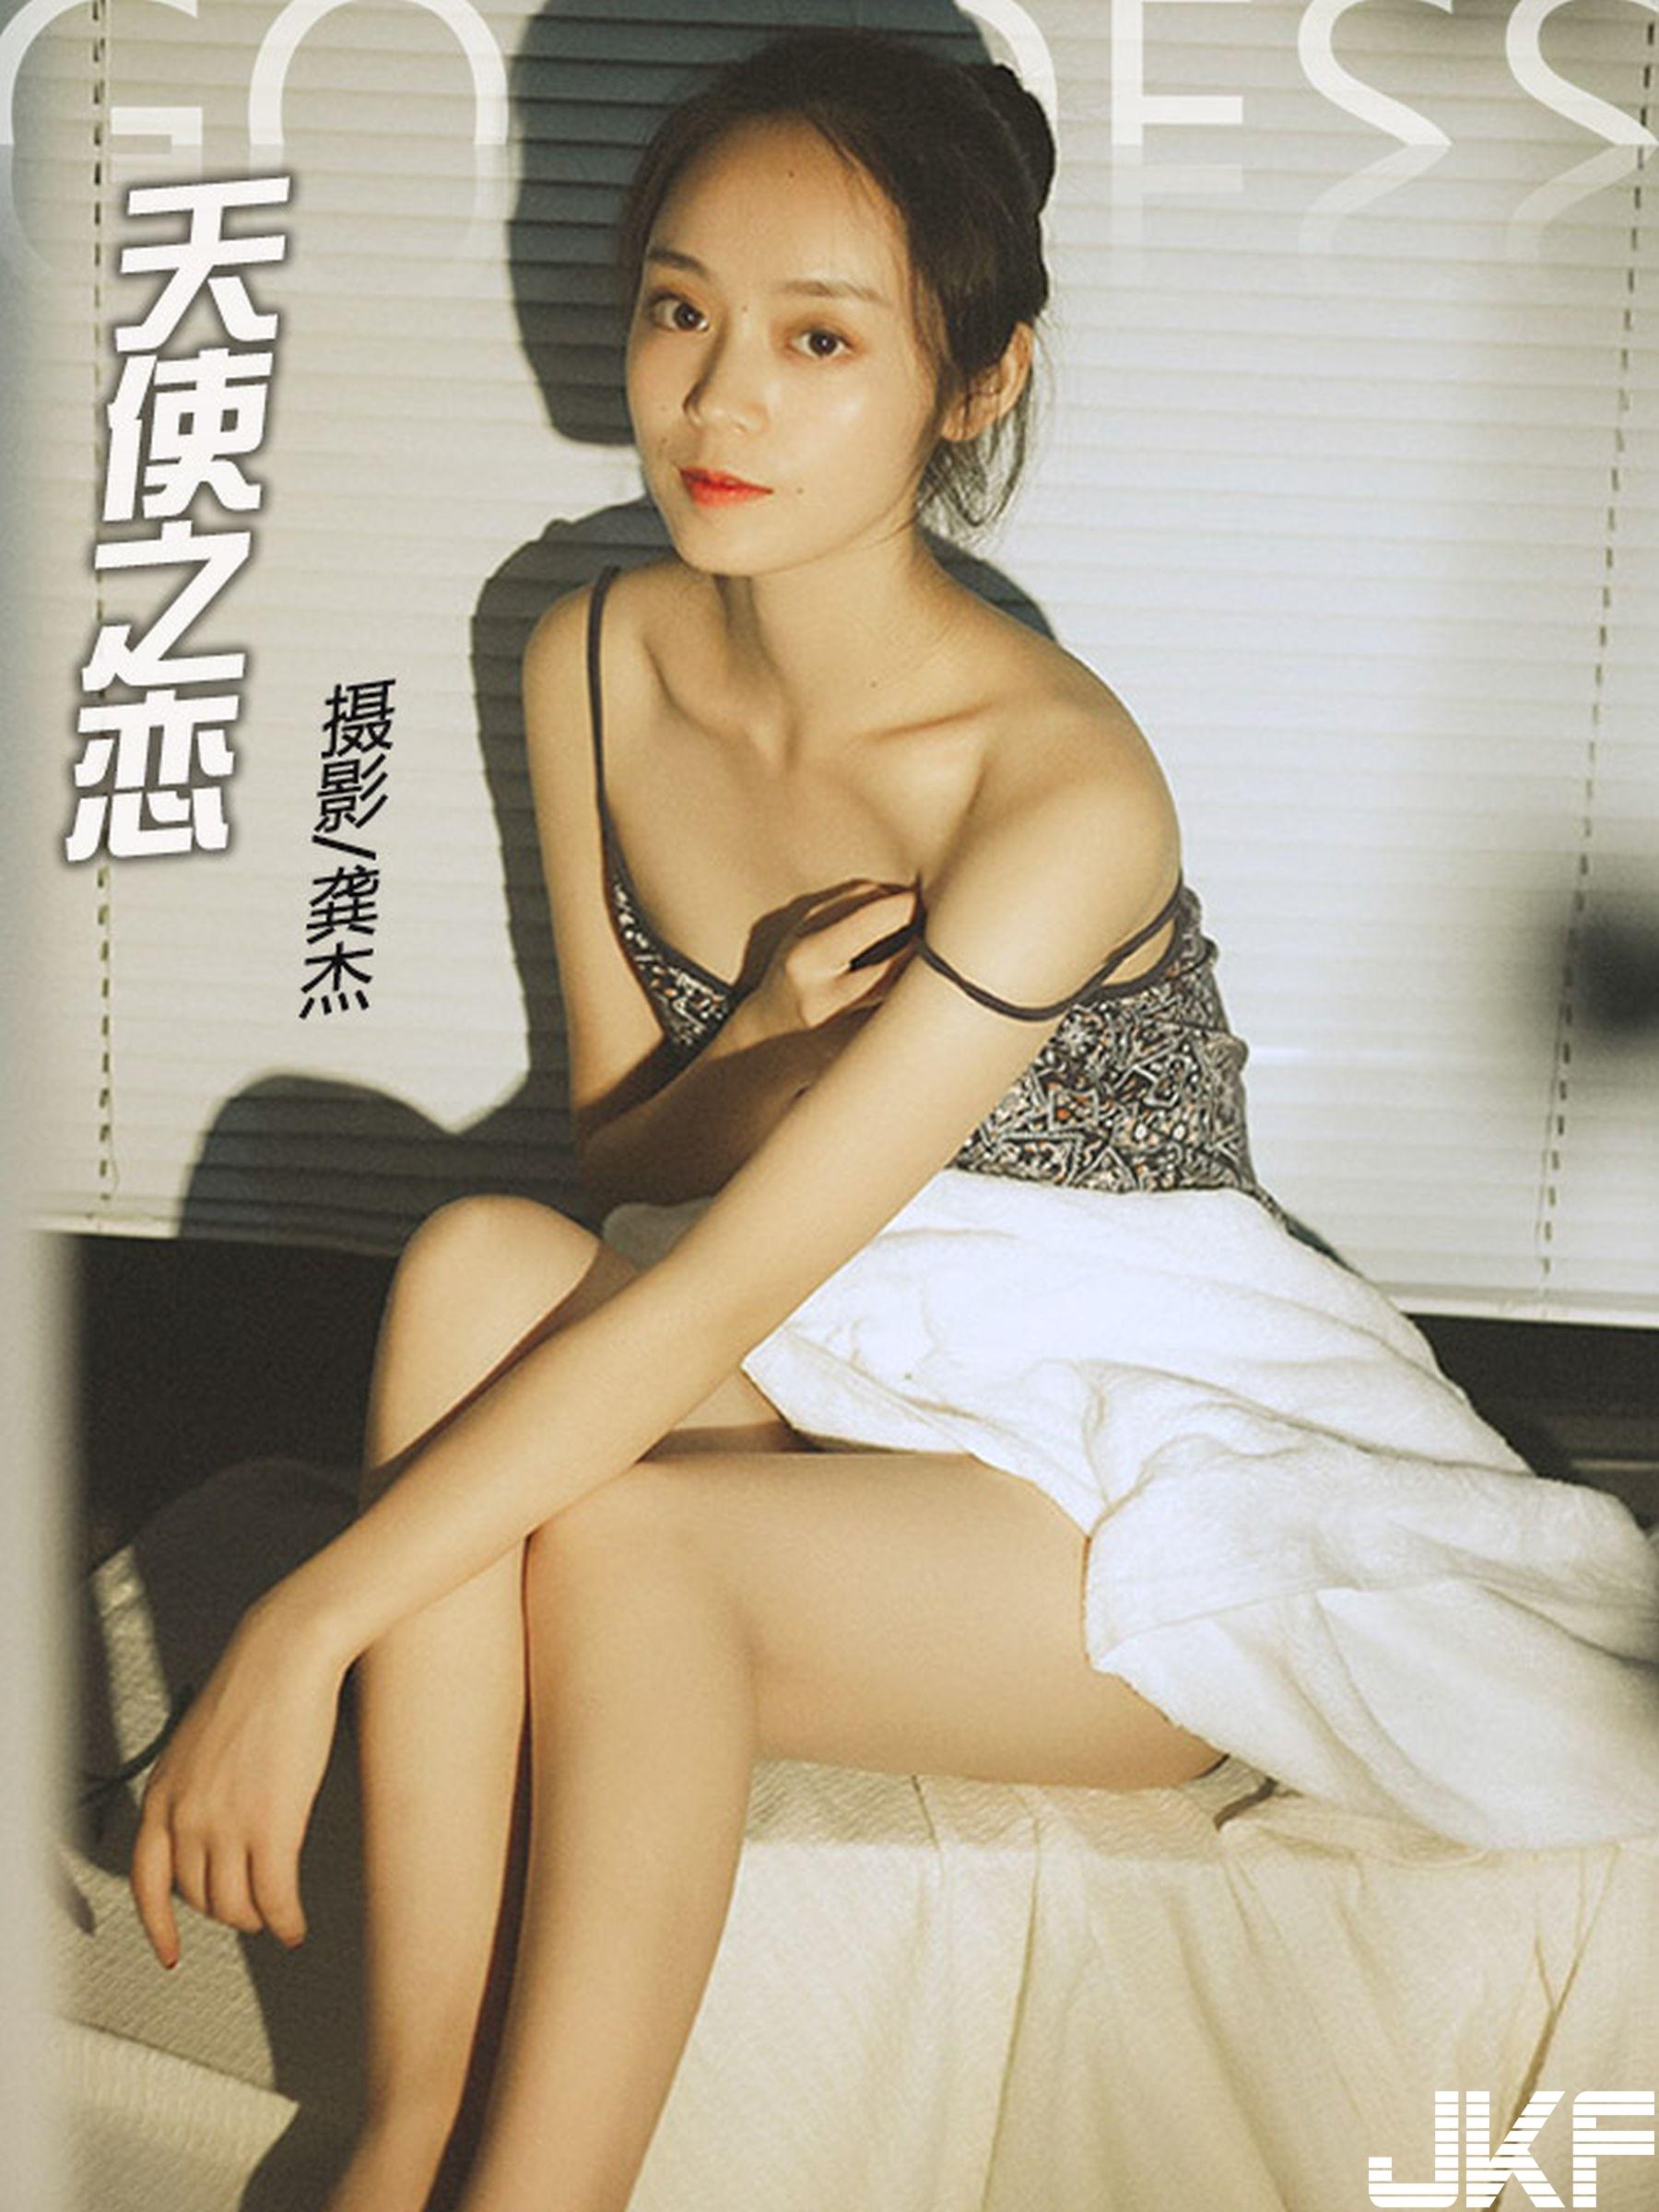 [TouTiao頭條女神] 2018.01.18 天使之戀 [17P] - 貼圖 - 絲襪美腿 -